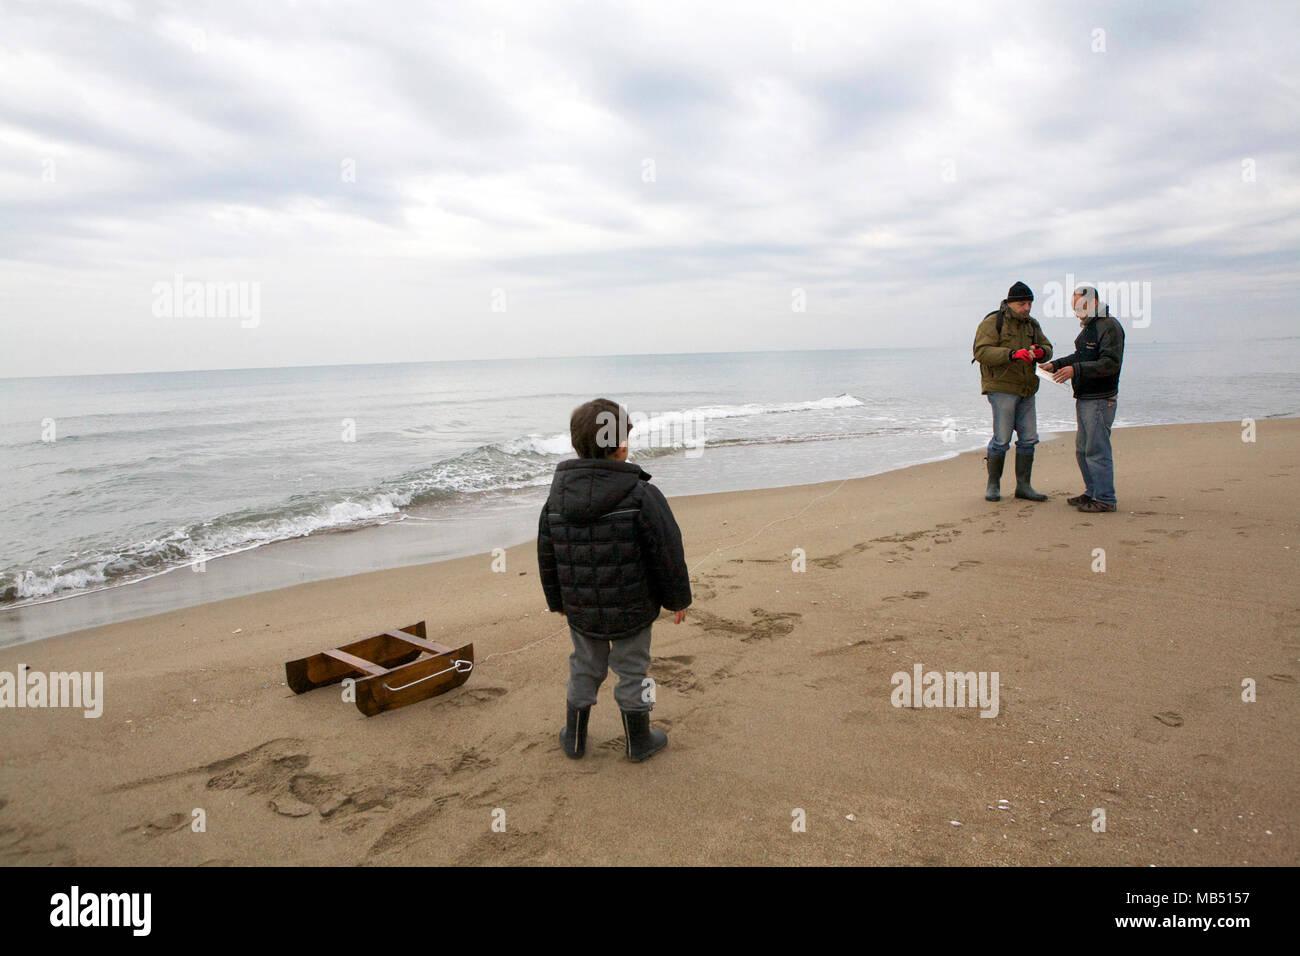 Little boy staring in wonder at fishermen on the beach, Lavinio, Italy - Stock Image